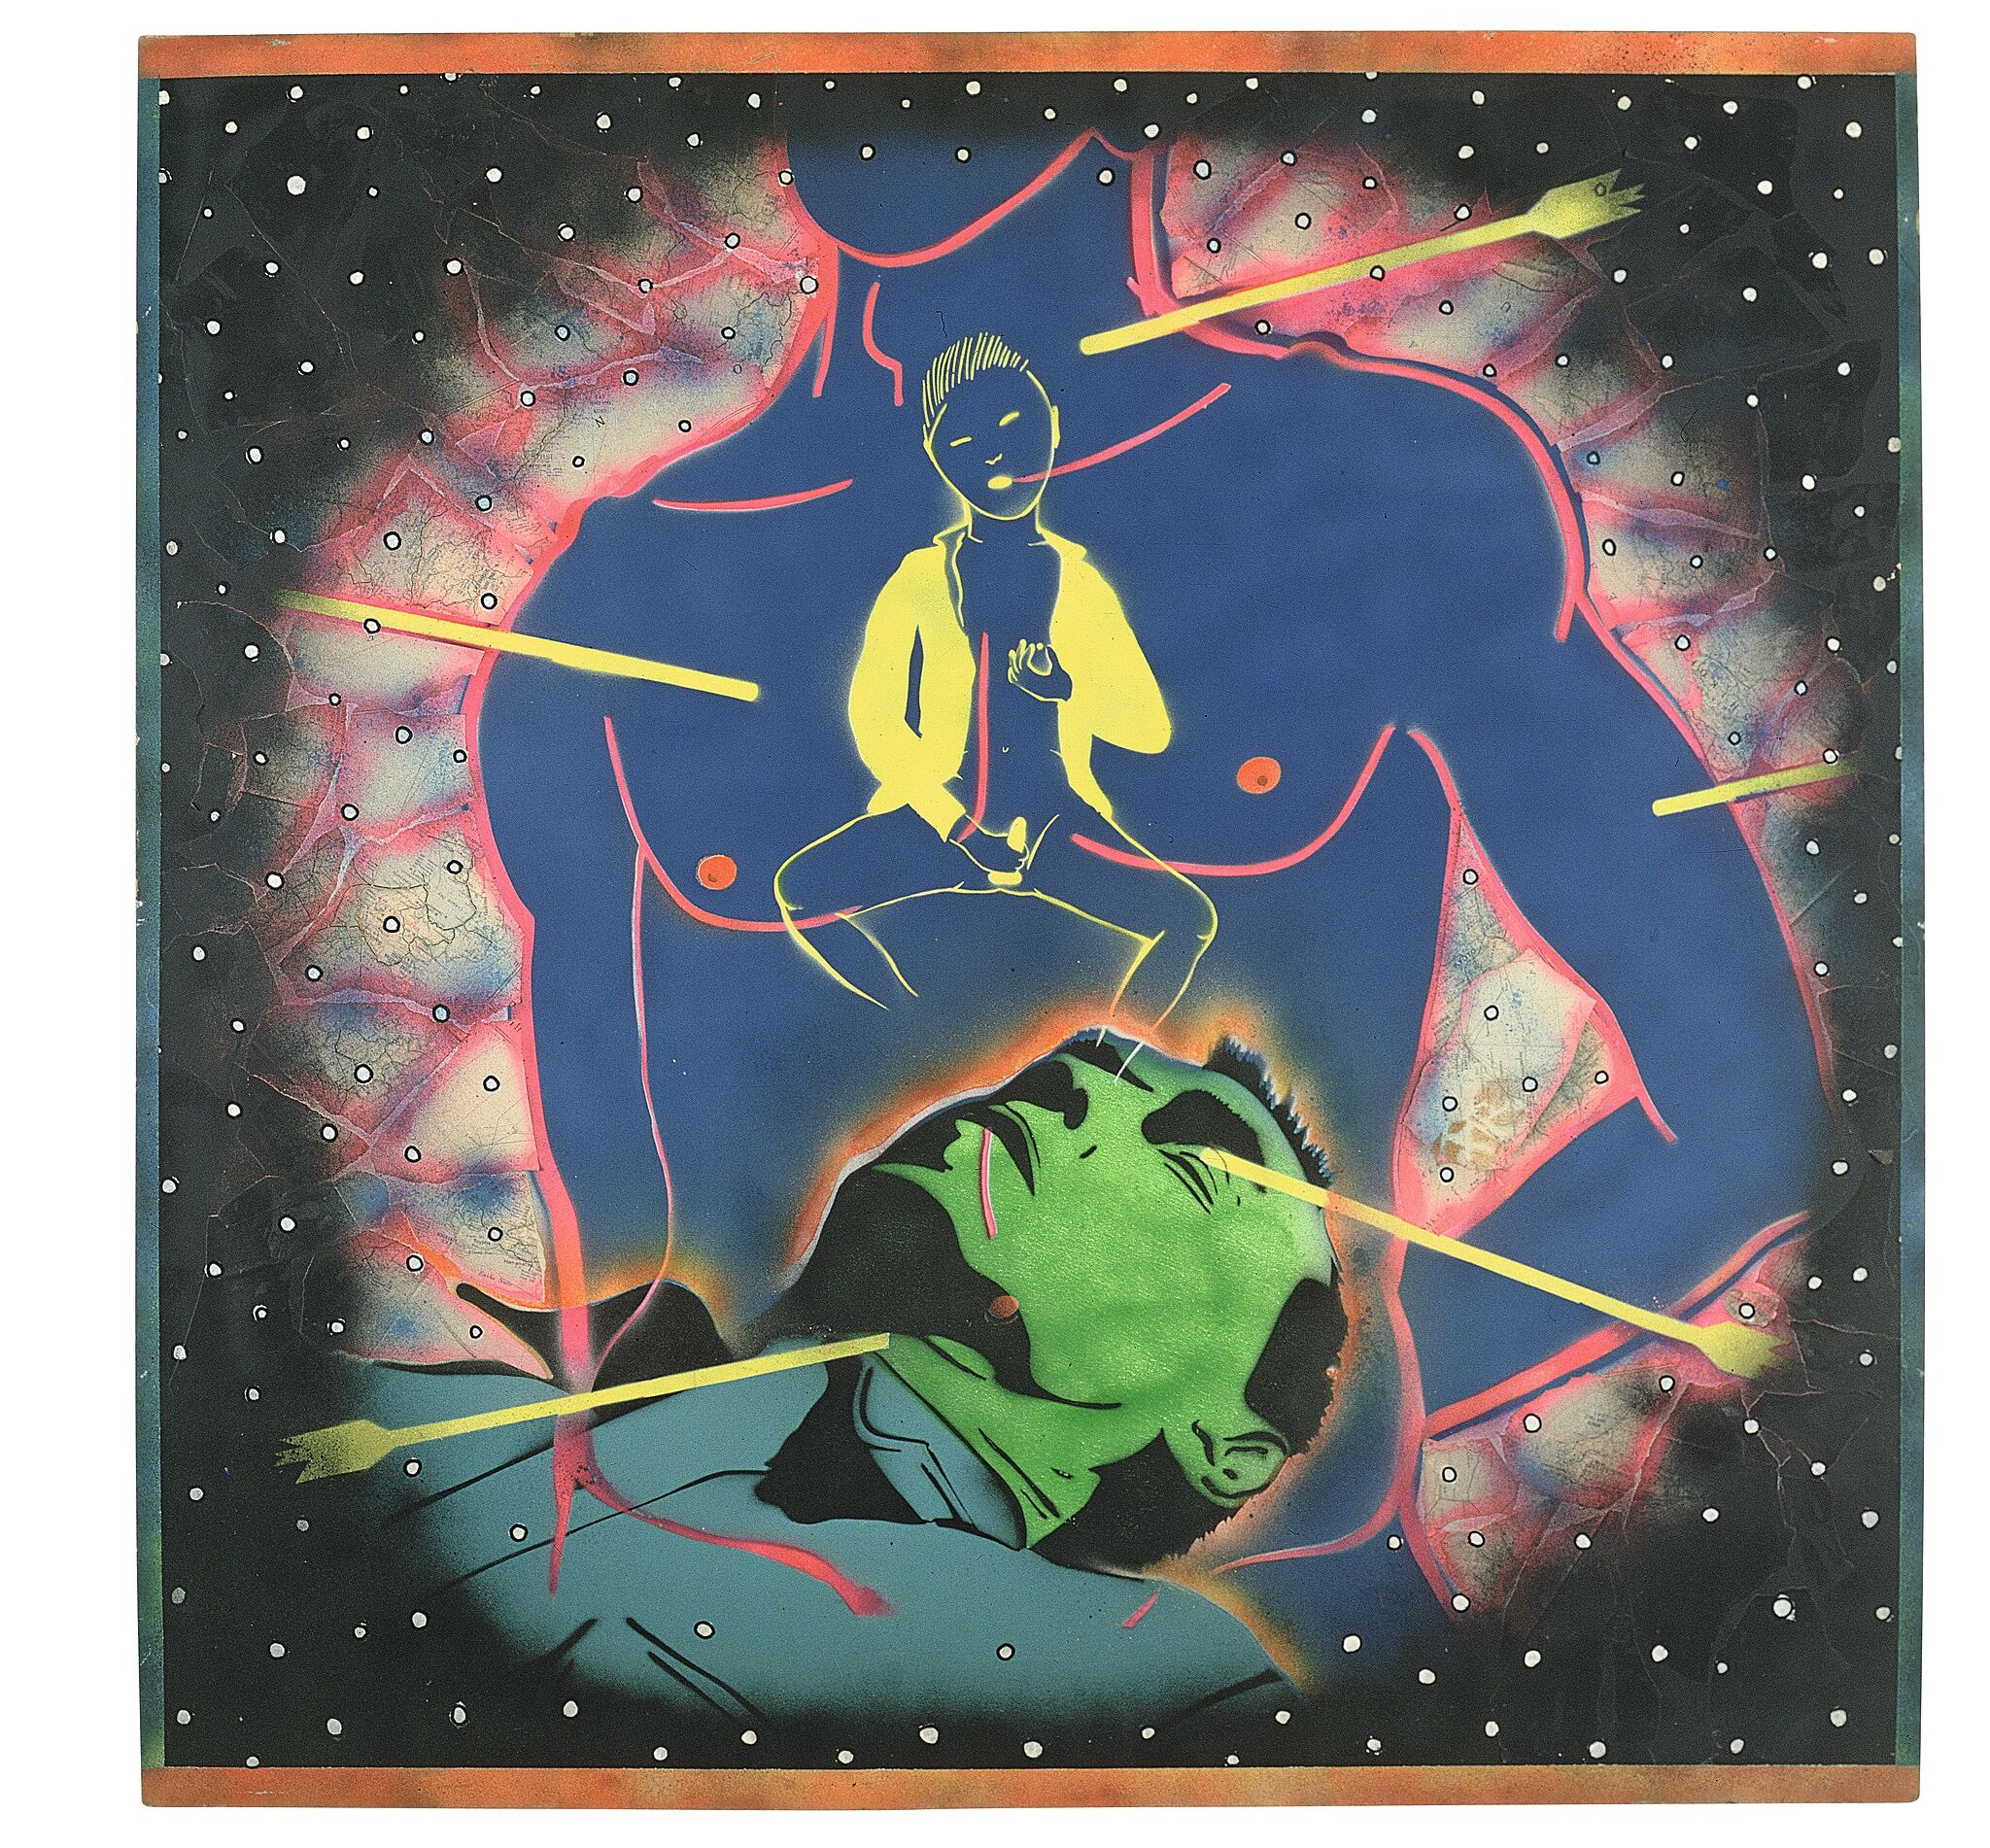 David Wojnarowicz: History Keeps Me Awake at Night | Whitney Museum of  American Art